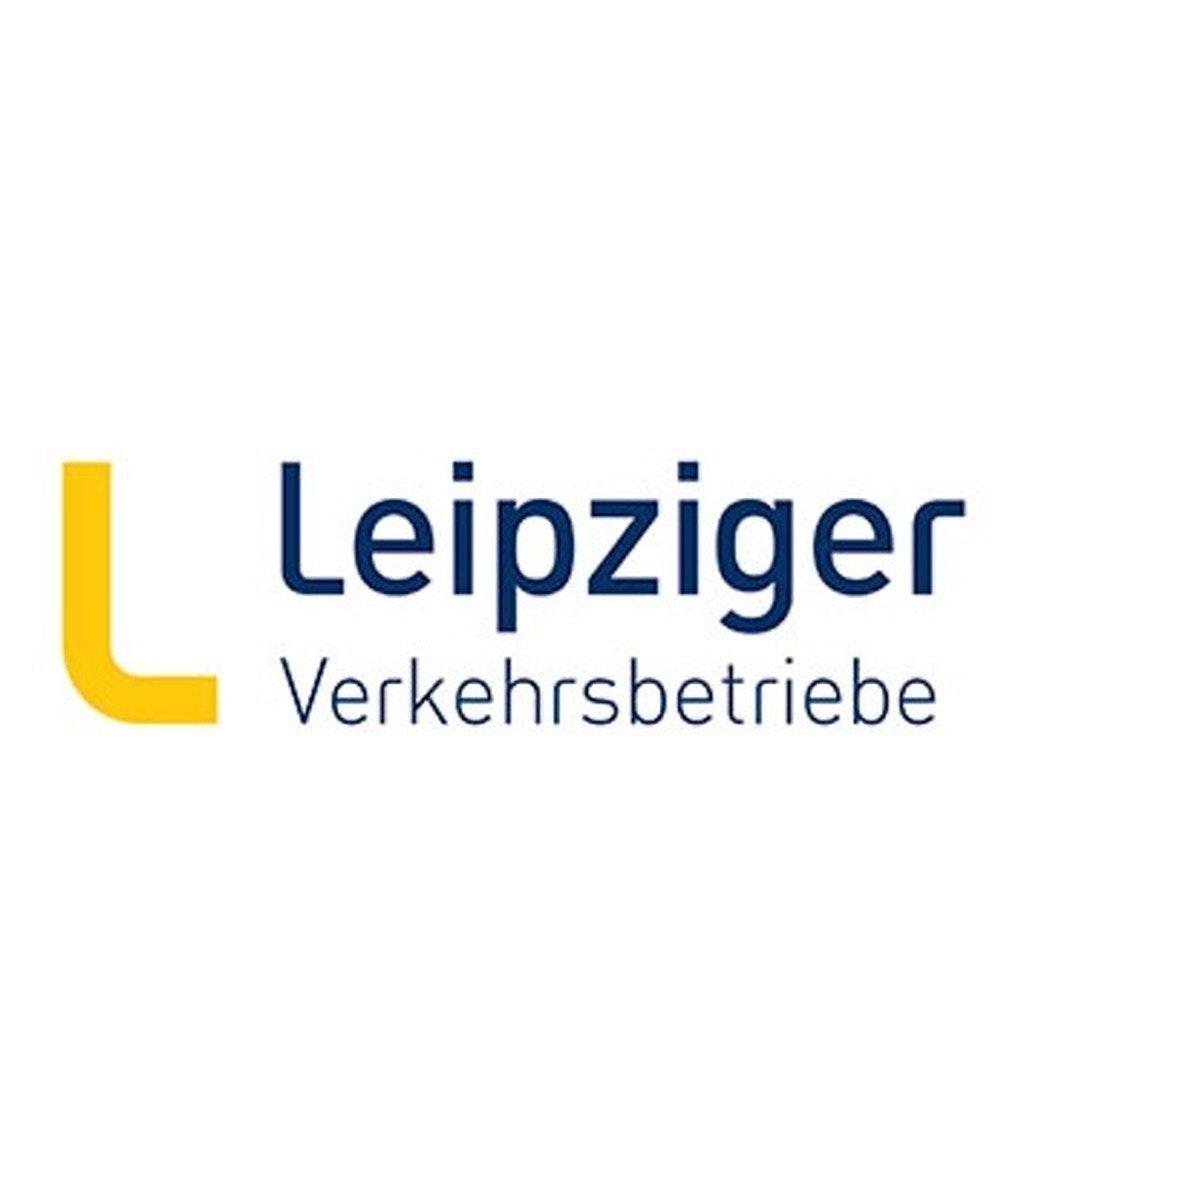 Leipziger Verkehrsbetriebe (LVB) GmbH